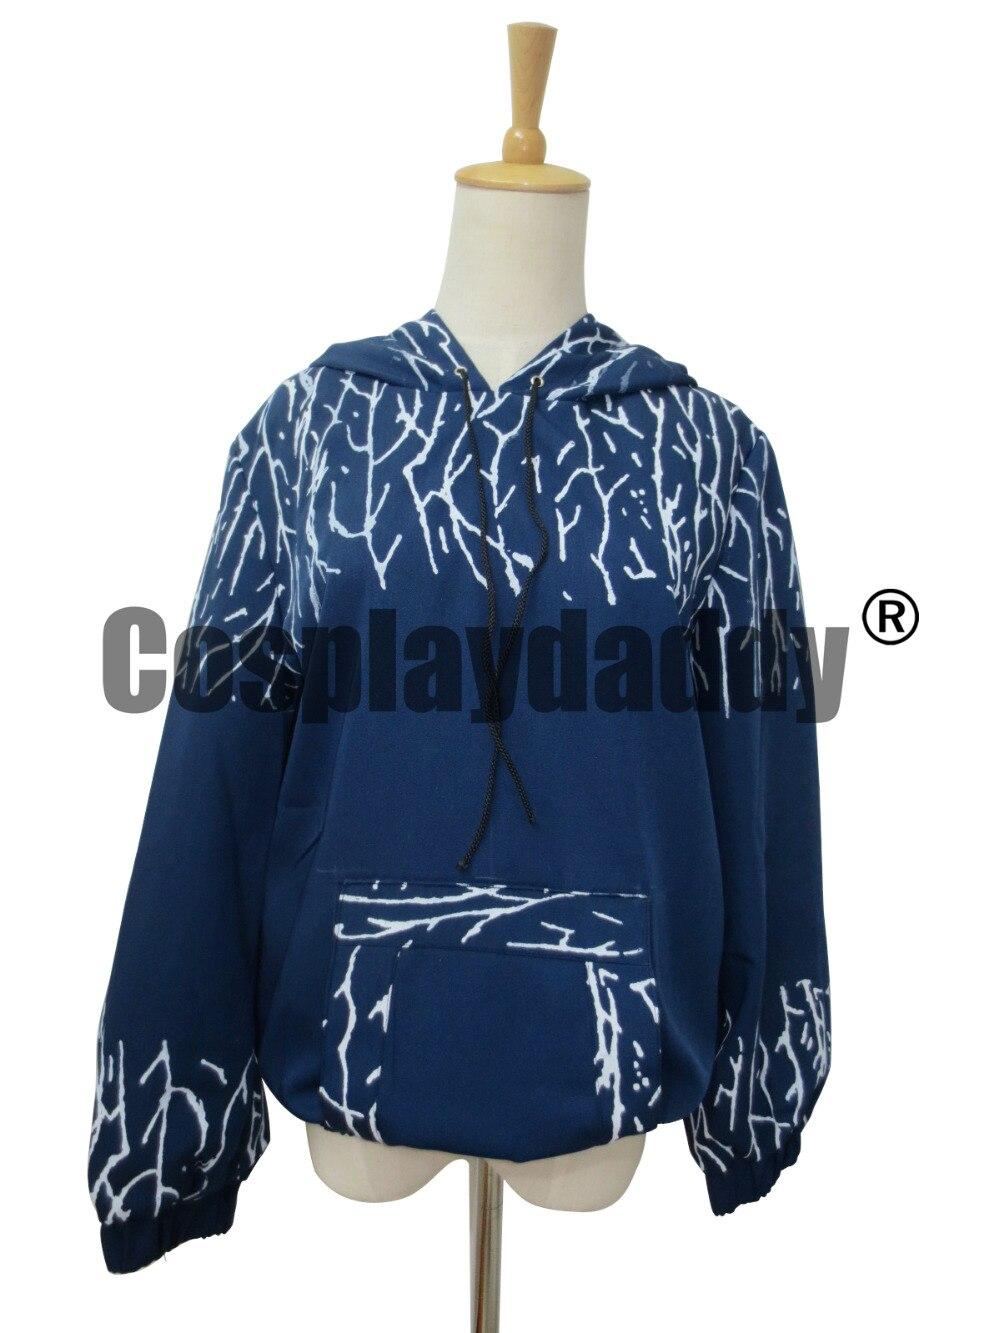 Rise of the Guardians Jack Frost Hoodie Cosplay Costume Hooded Sweatshirt